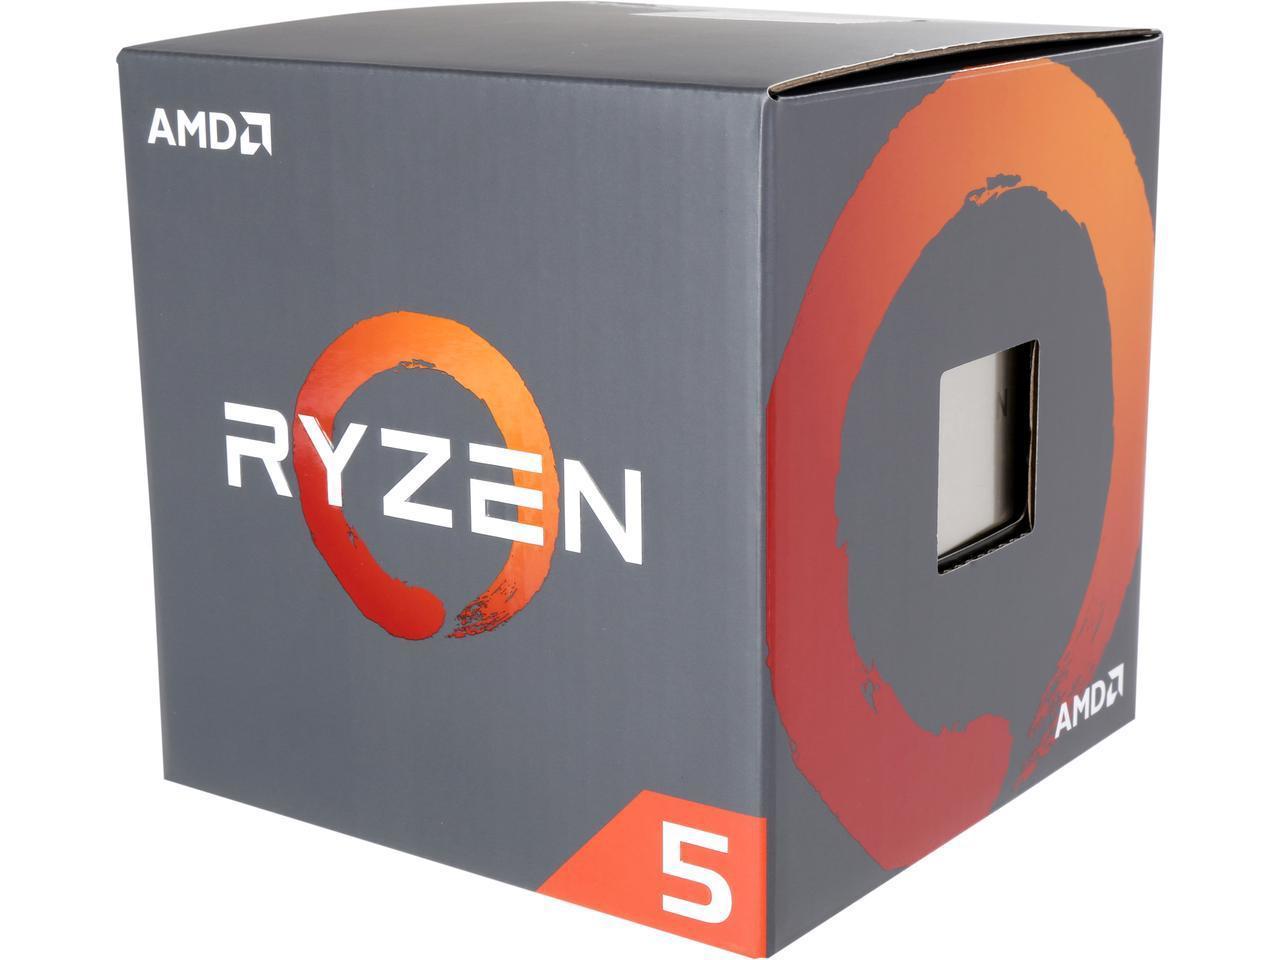 AMD Ryzen 5 1600 6-Core 3.2GHz AM4 Processor $144.99 + Free Shipping via Newegg